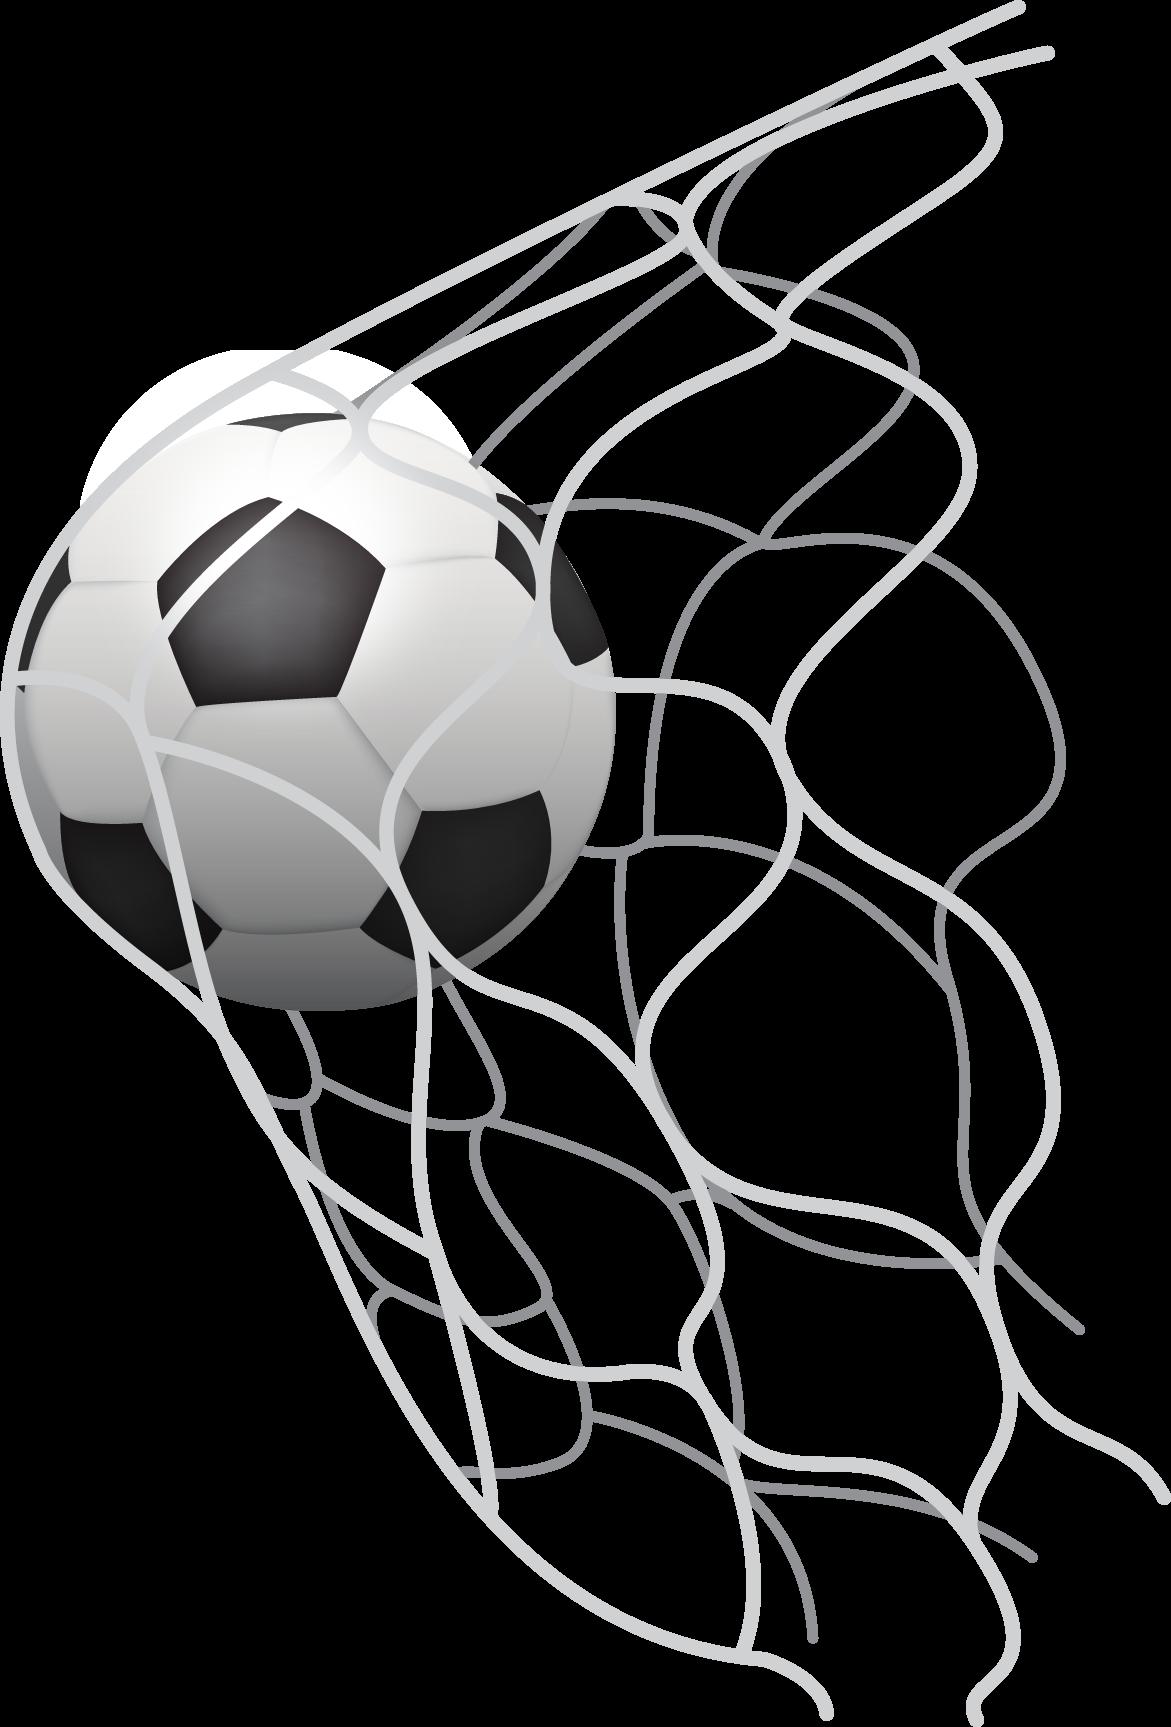 Football clipart gate. Goal drawing at getdrawings